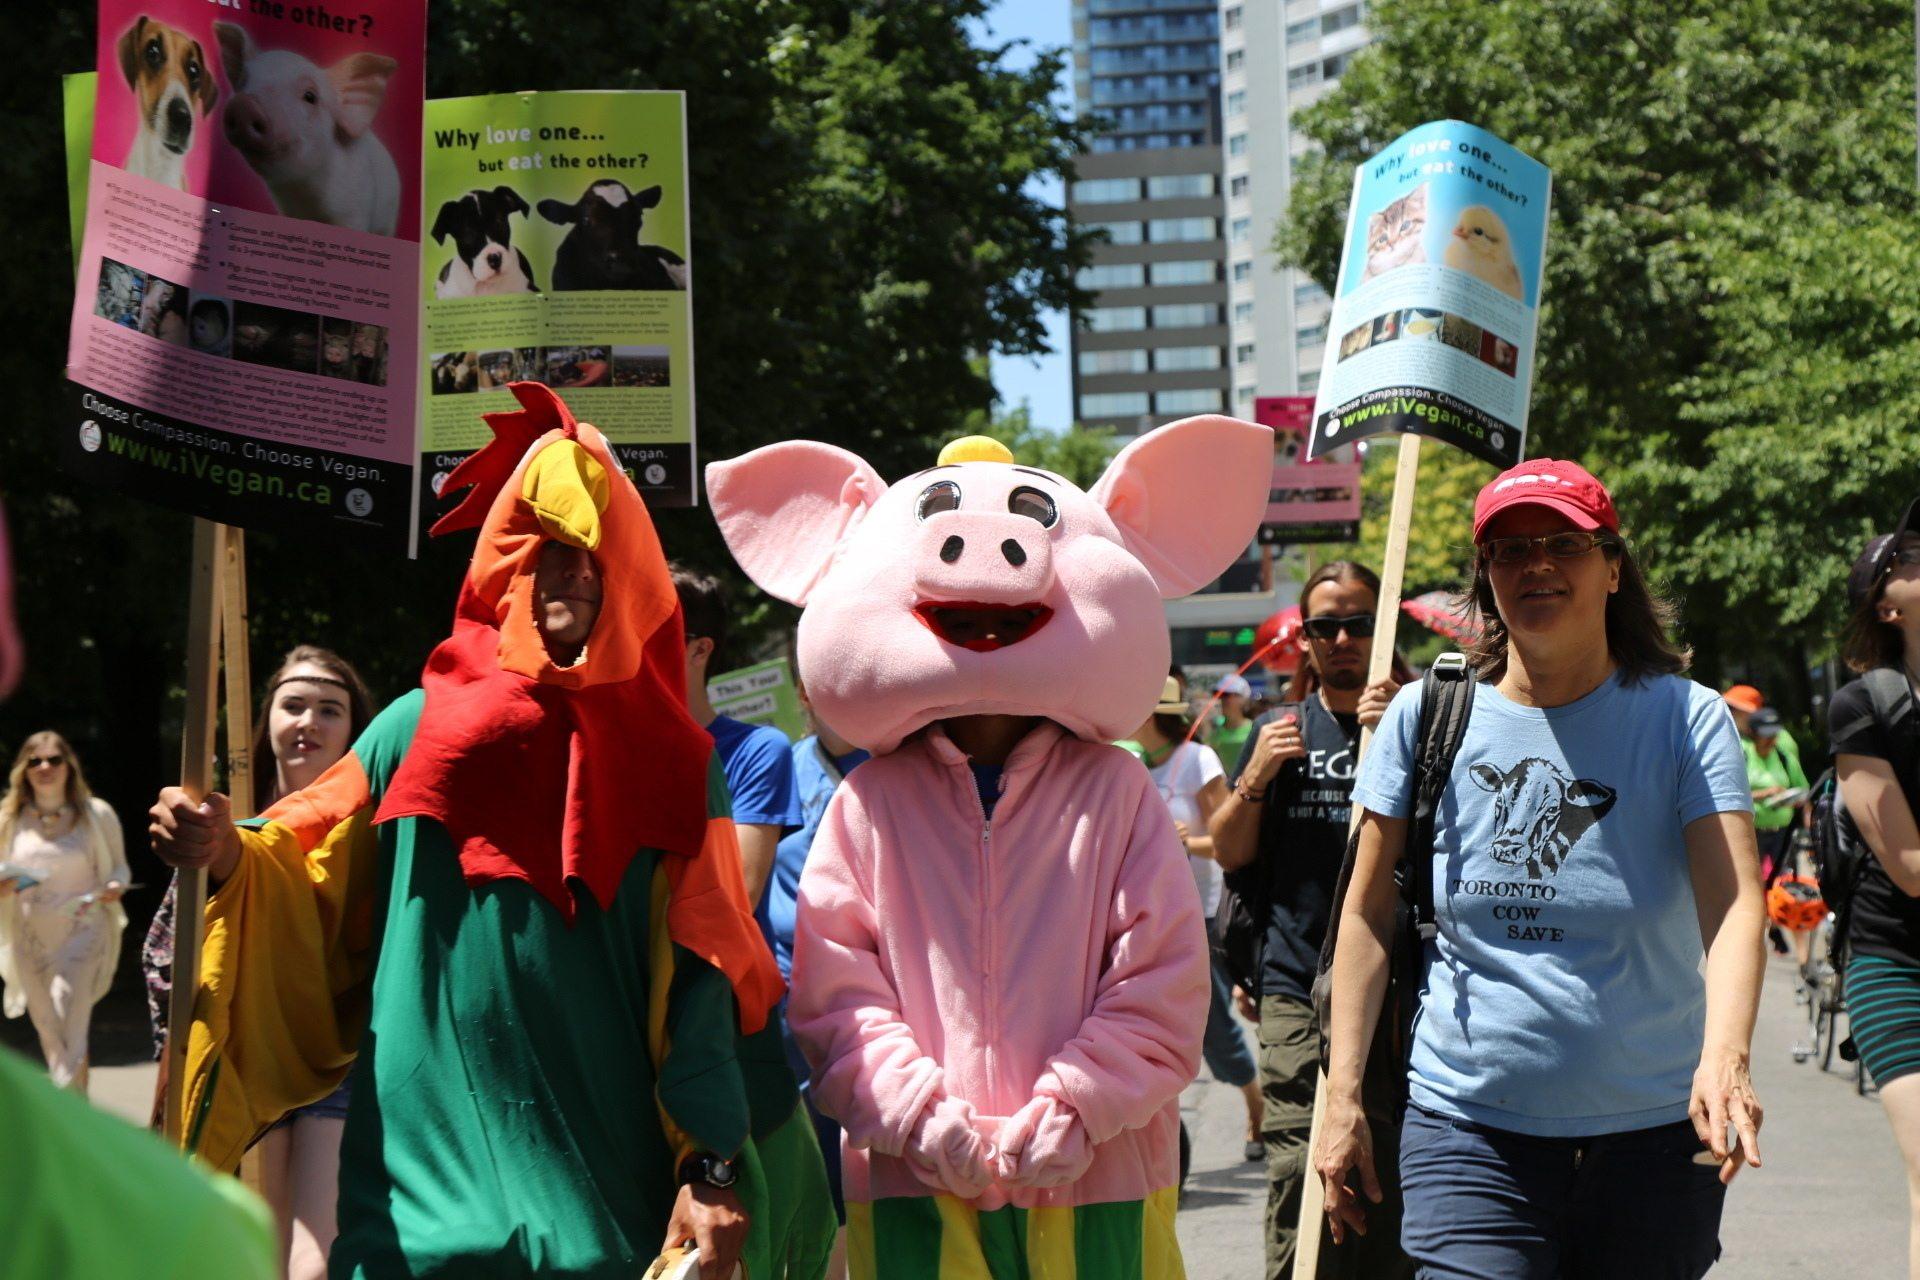 Chick-fil-A's 'Cow Mascot' Moos Veganism